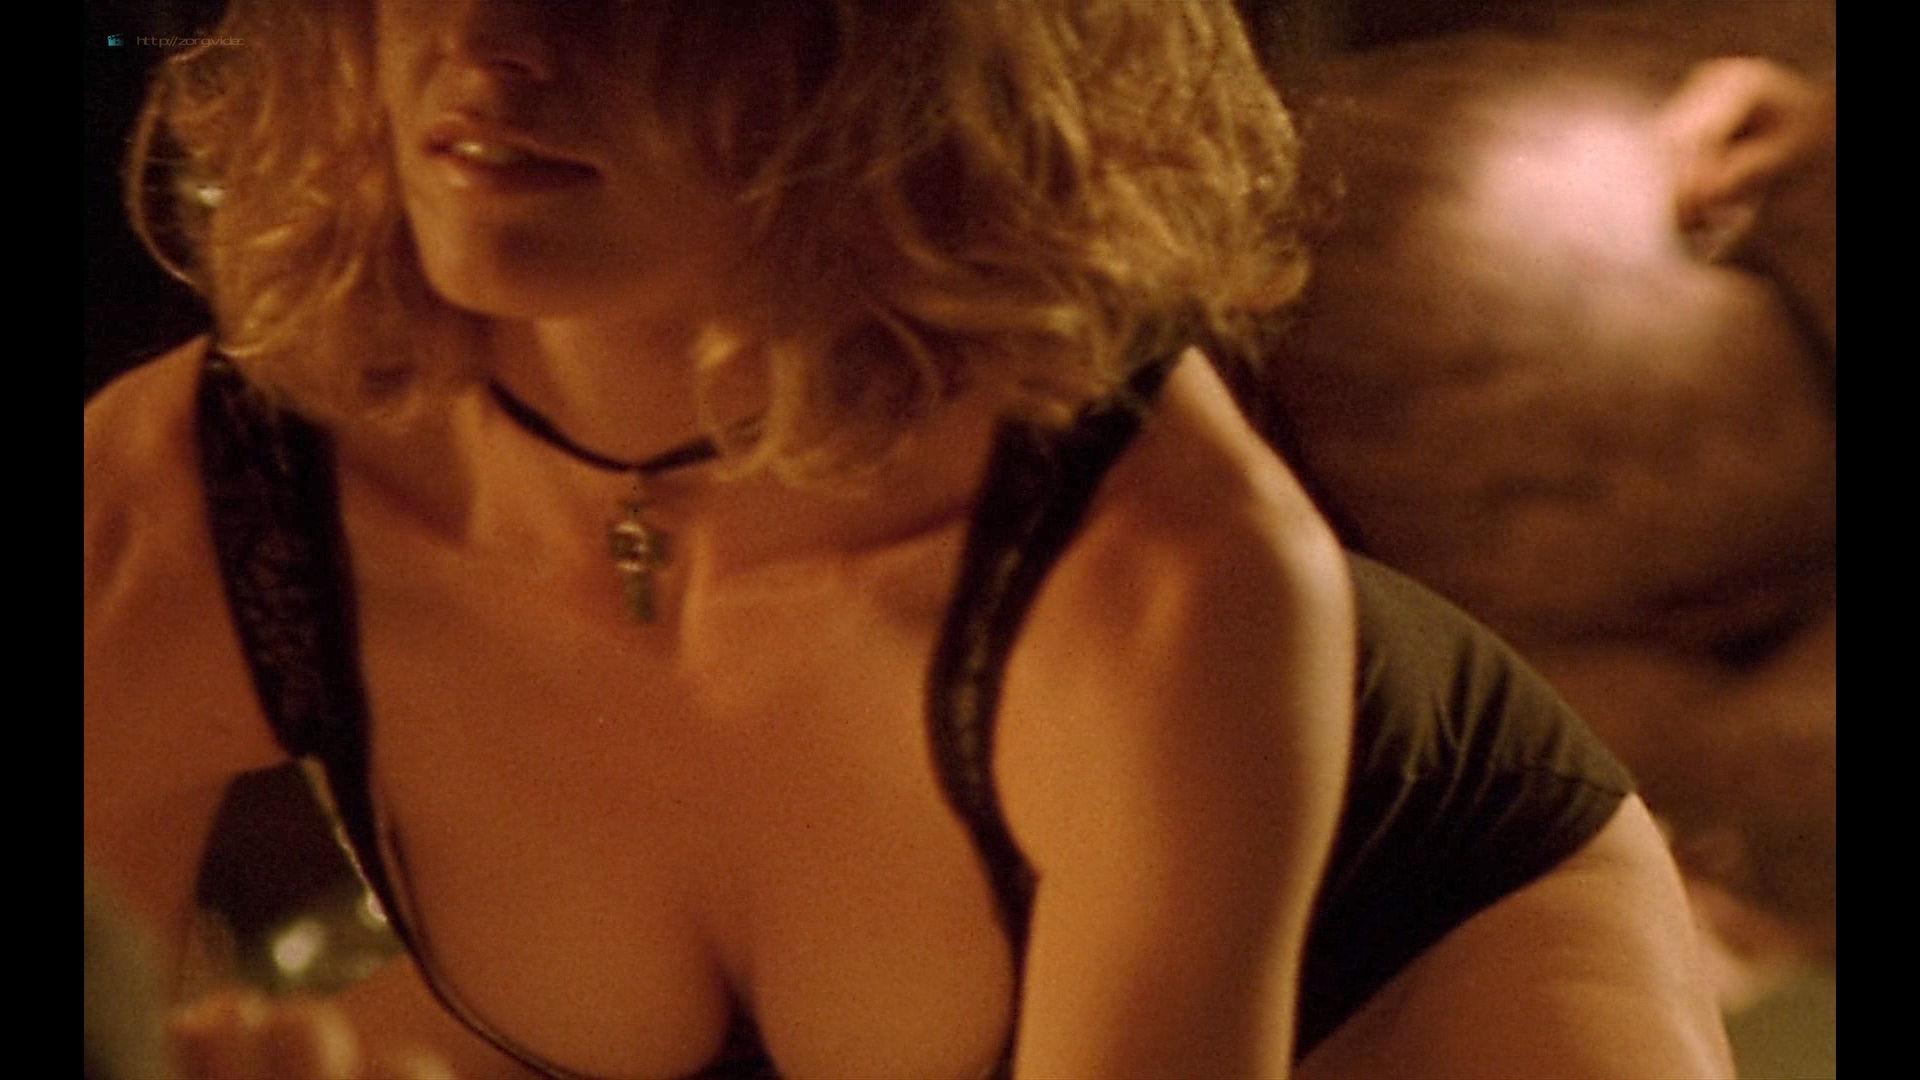 Elisabeth Shue nude topless sex - Leaving Las Vegas (1995) HD 1080p BluRay (15)